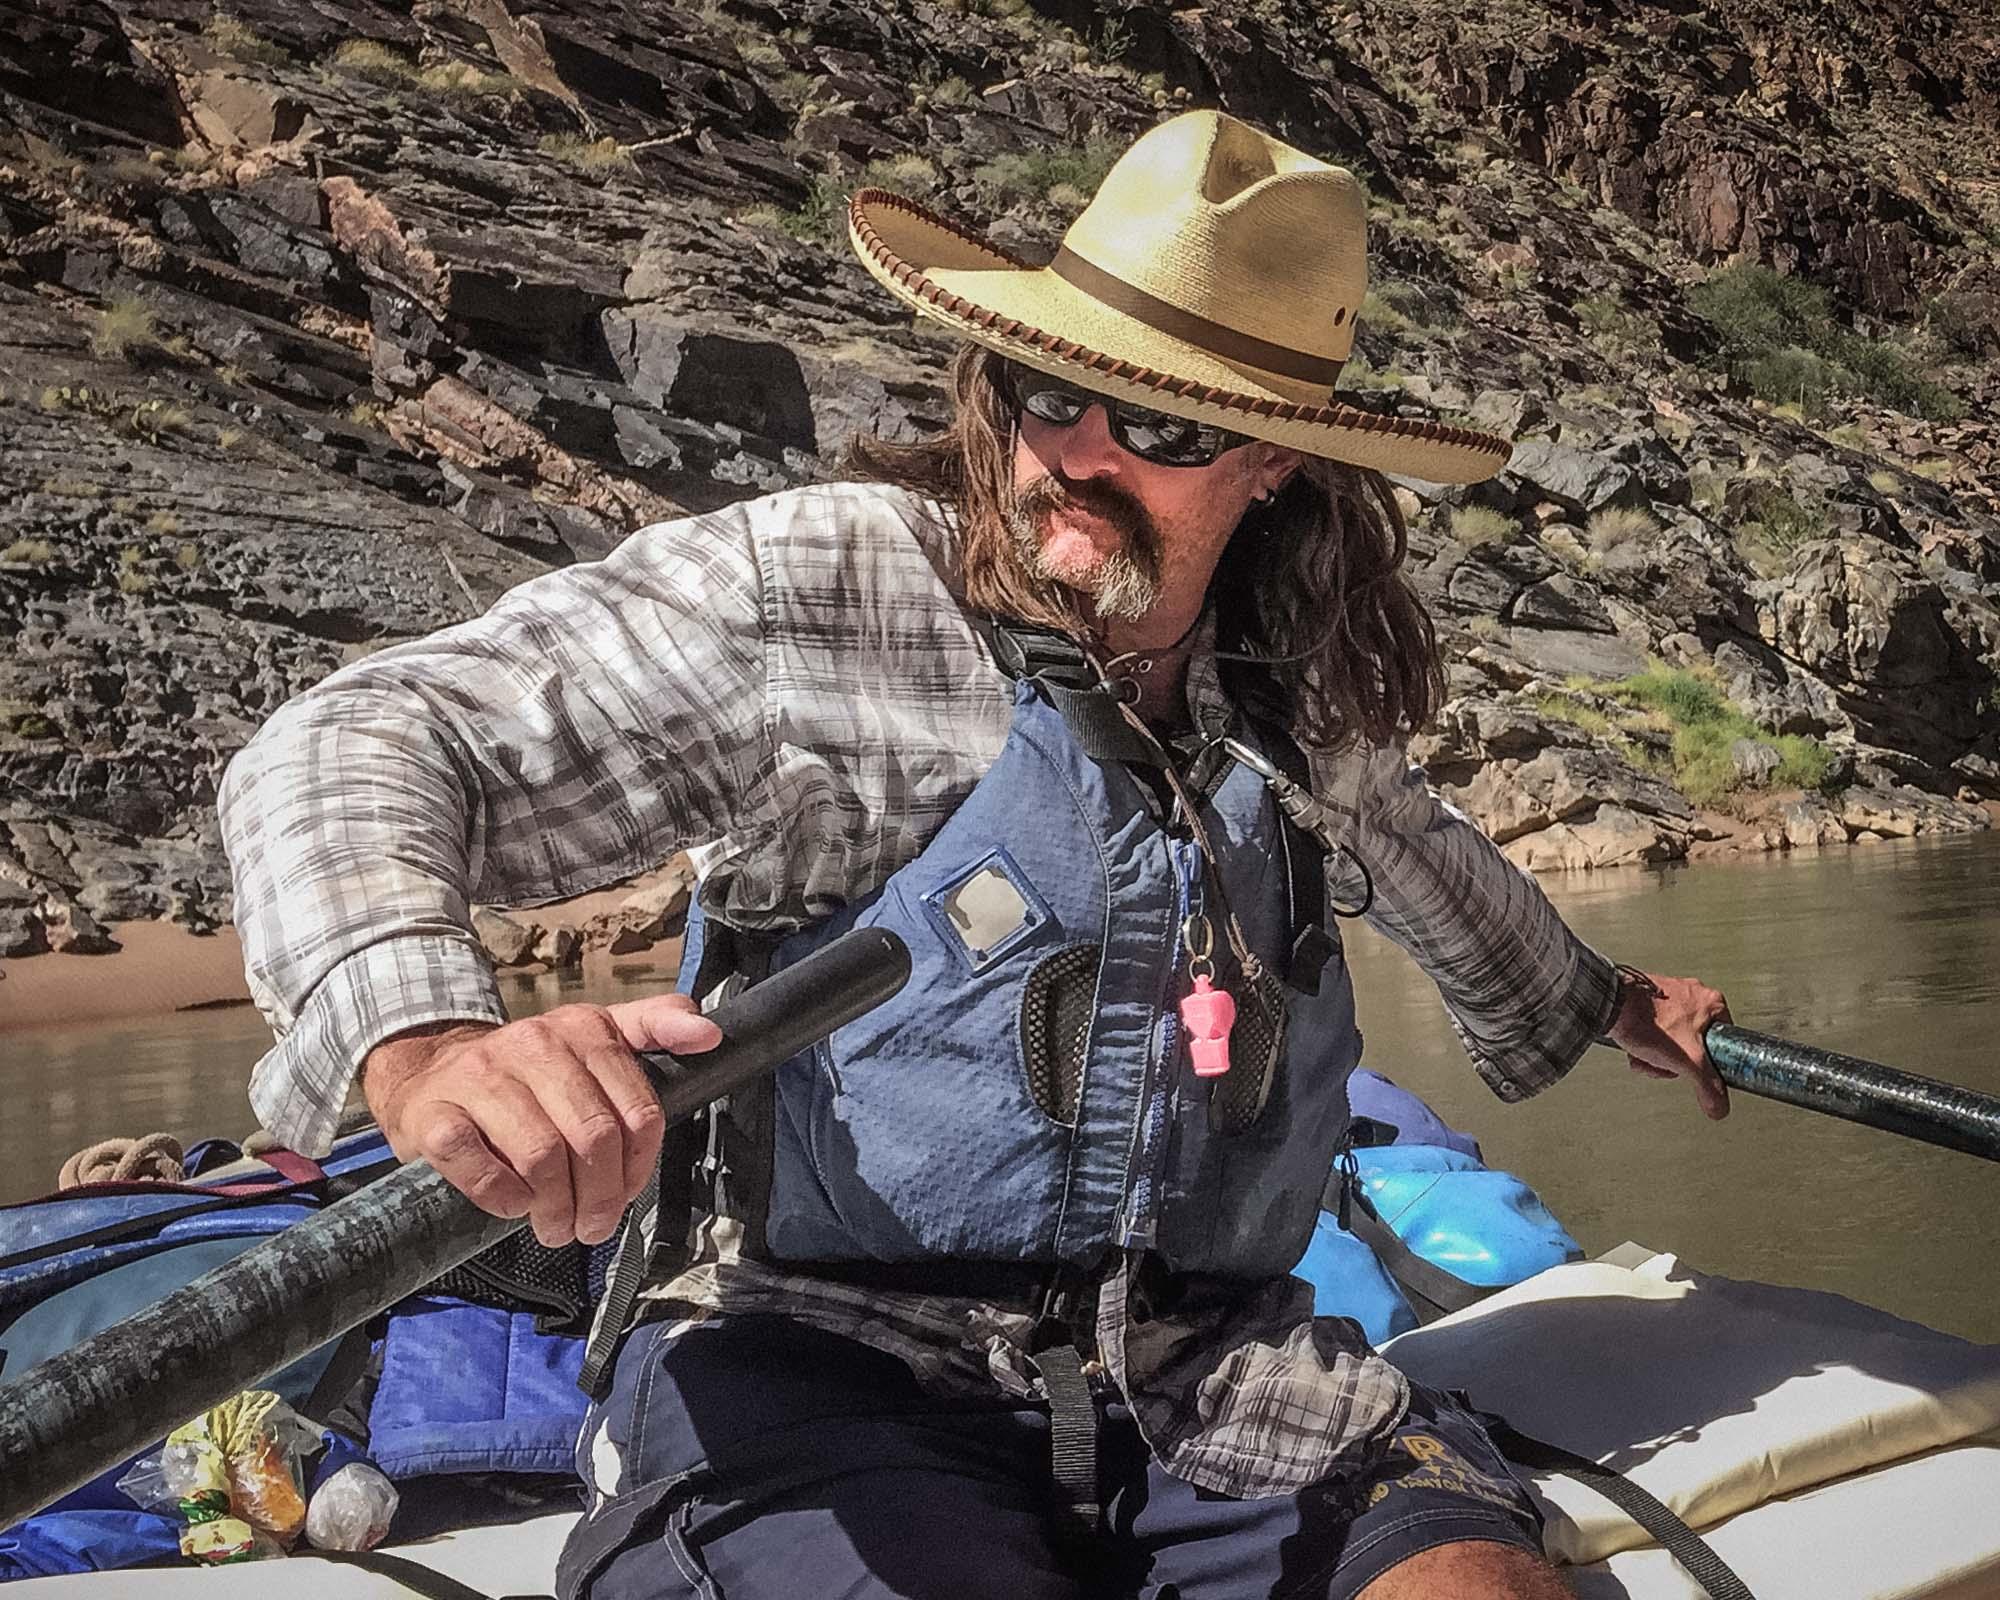 Chad - Boatman on the Colorado